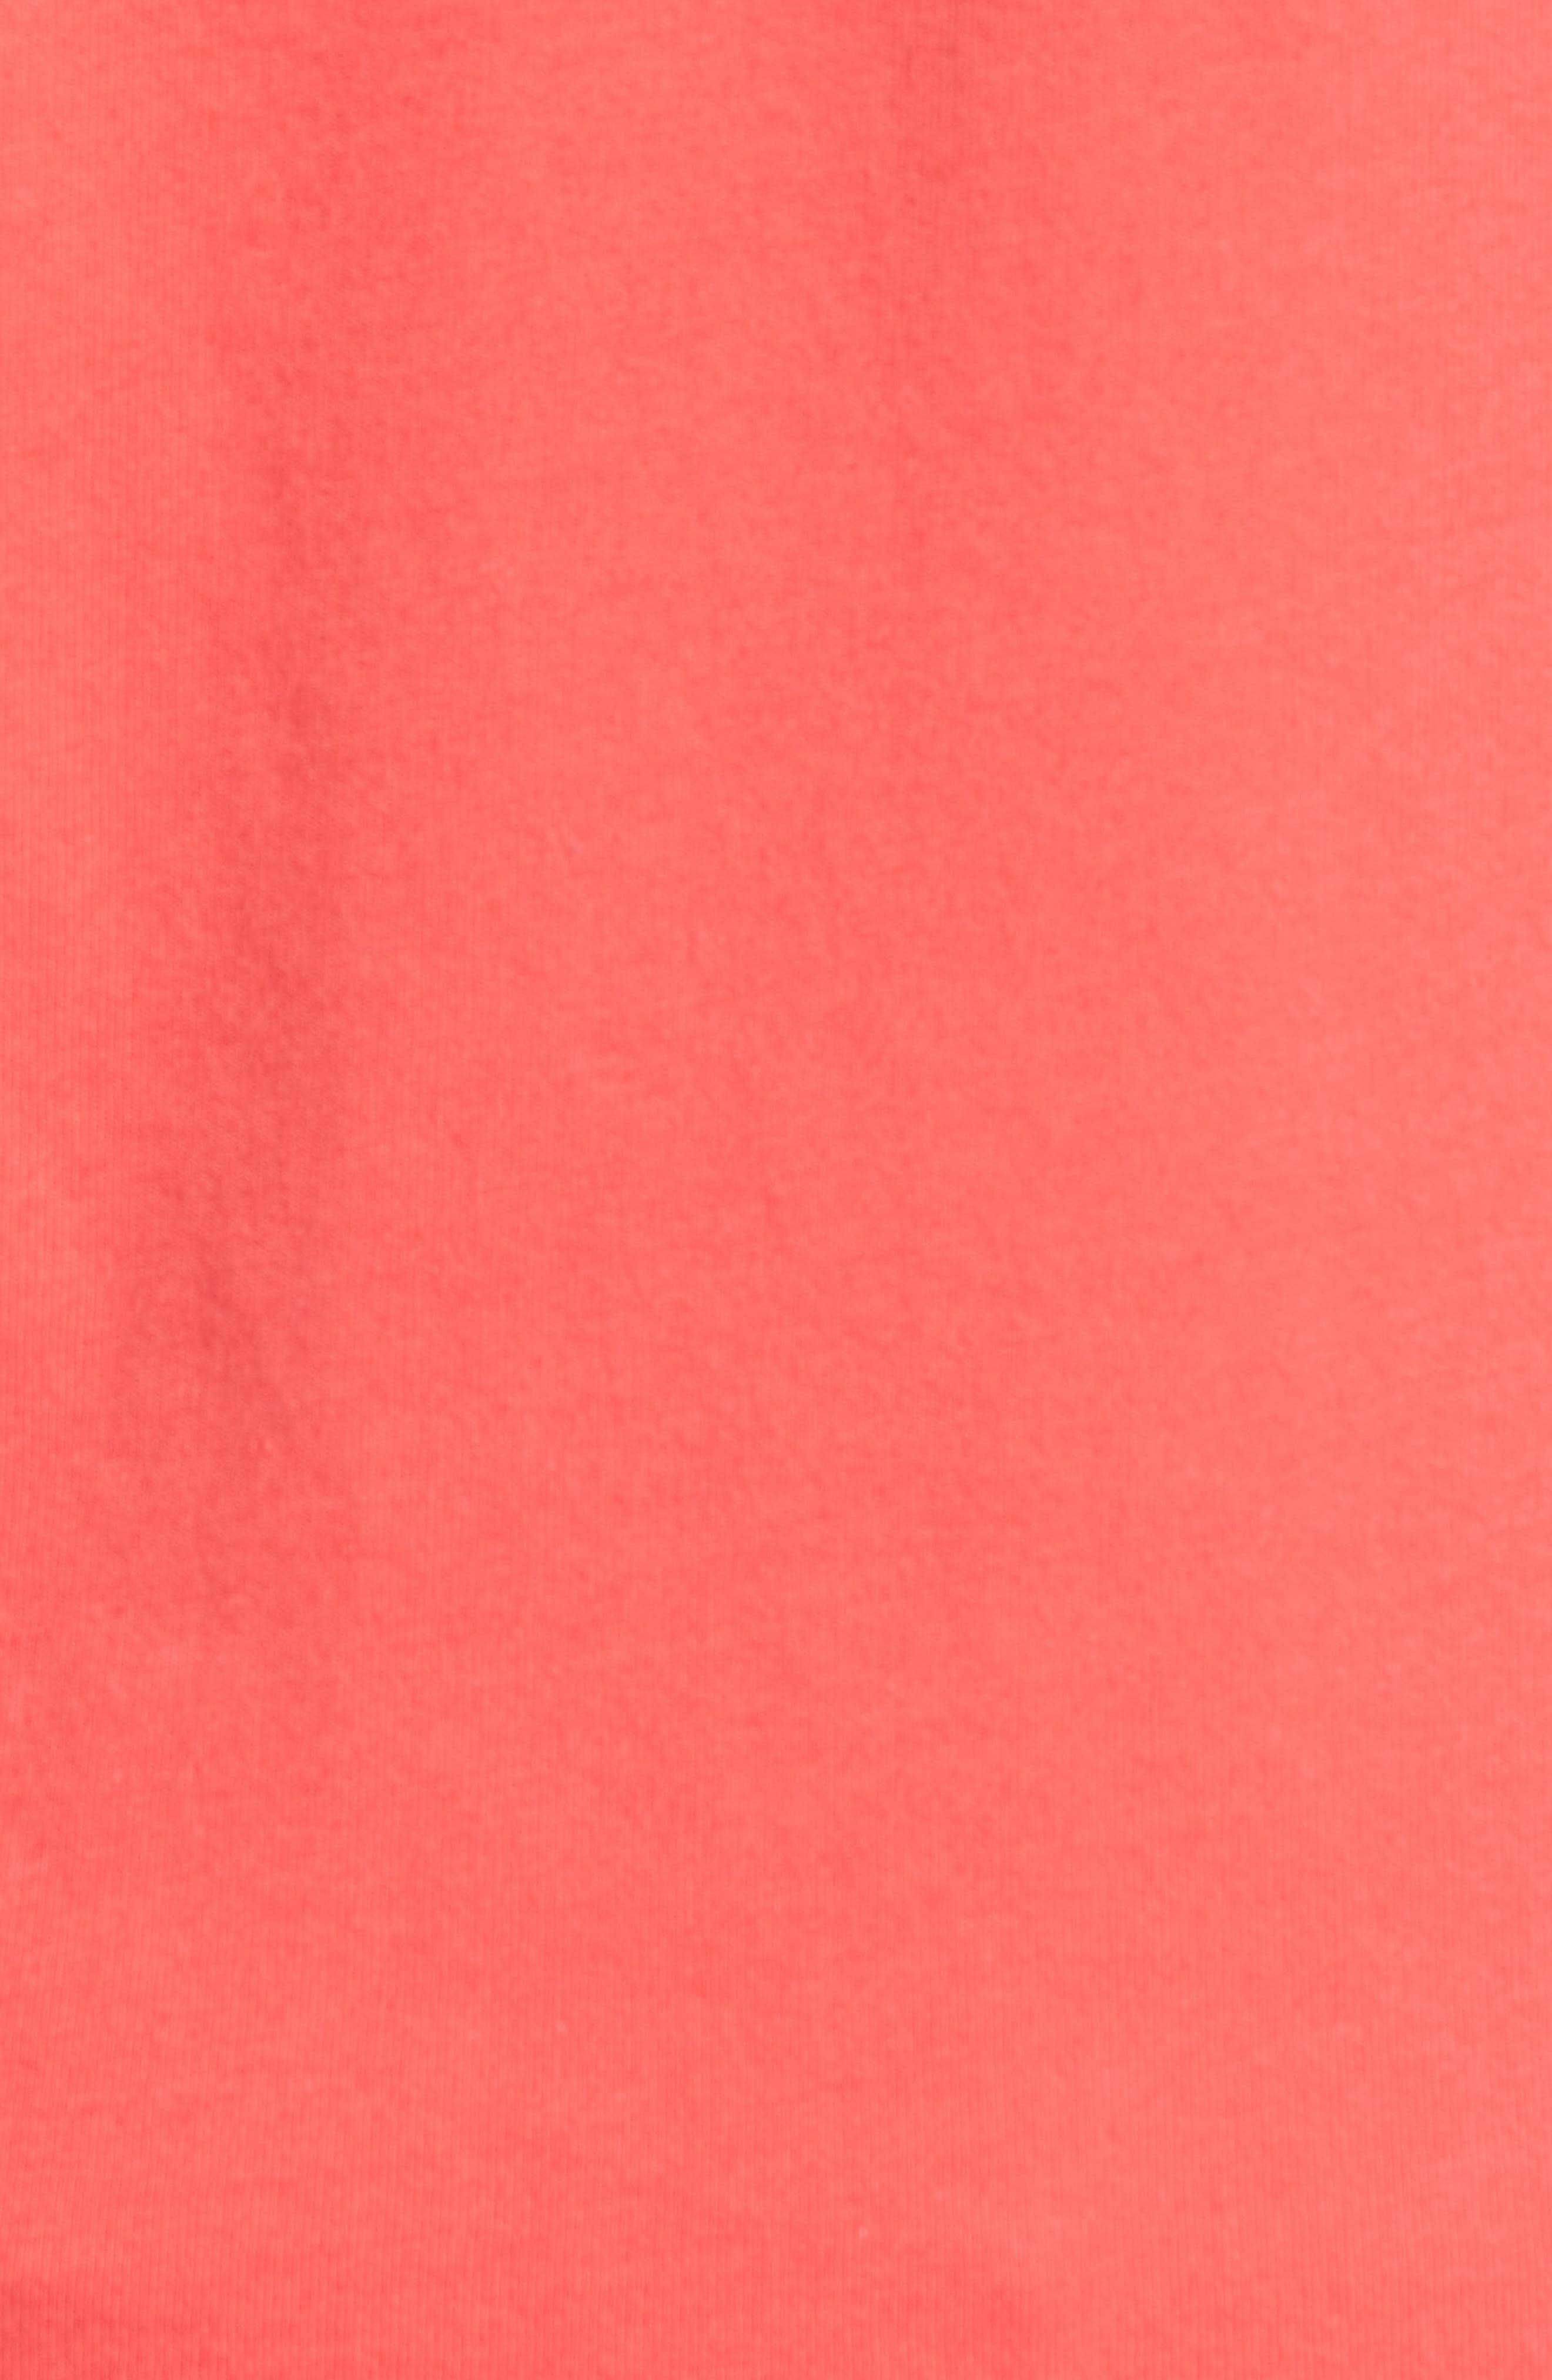 Grate Outdoors T-Shirt,                             Alternate thumbnail 5, color,                             600